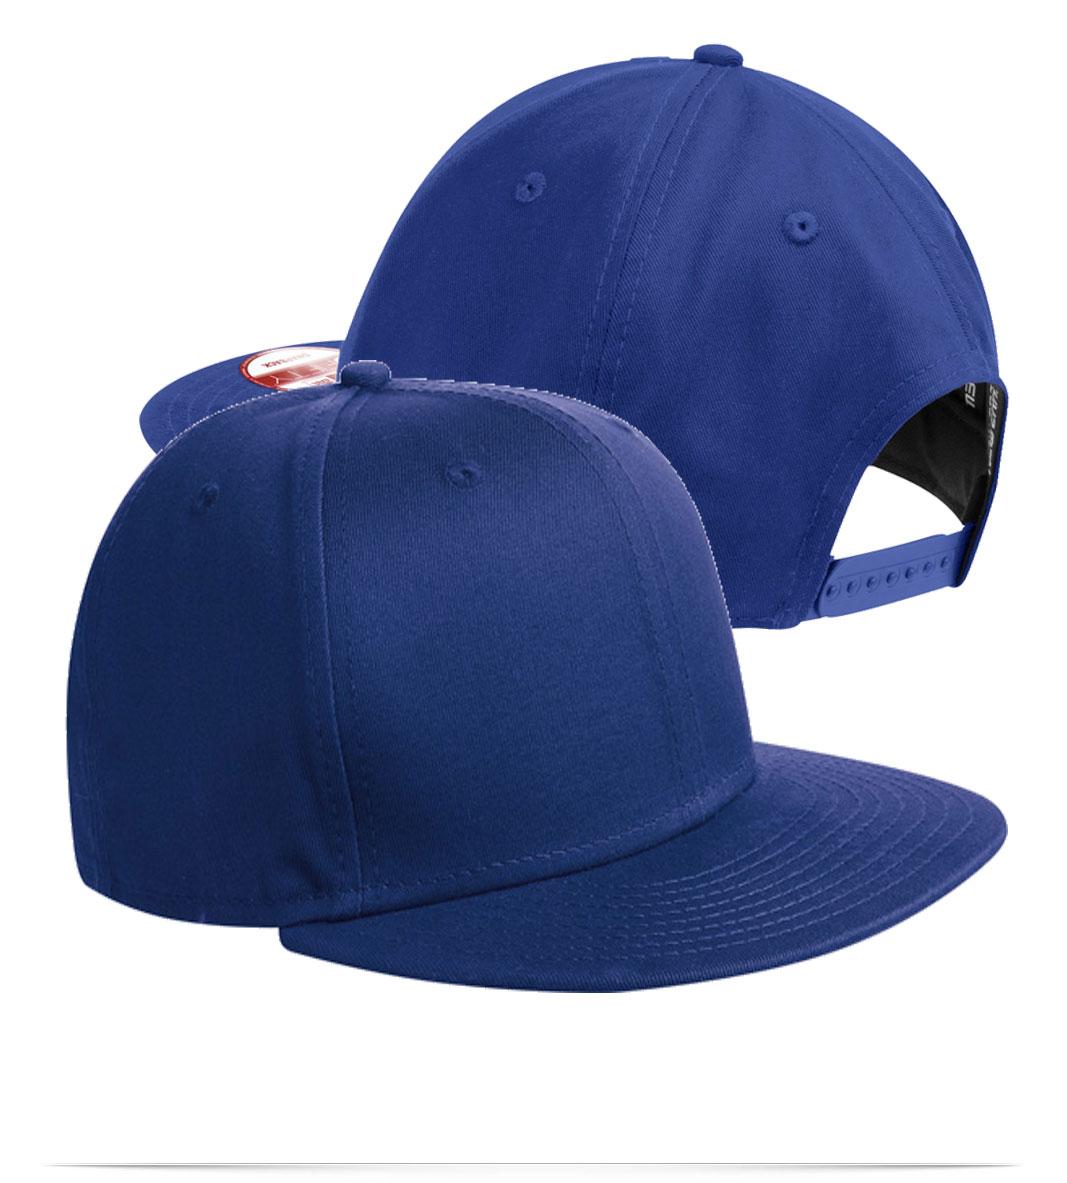 Customize New Era Flat Bill Snapback Cap